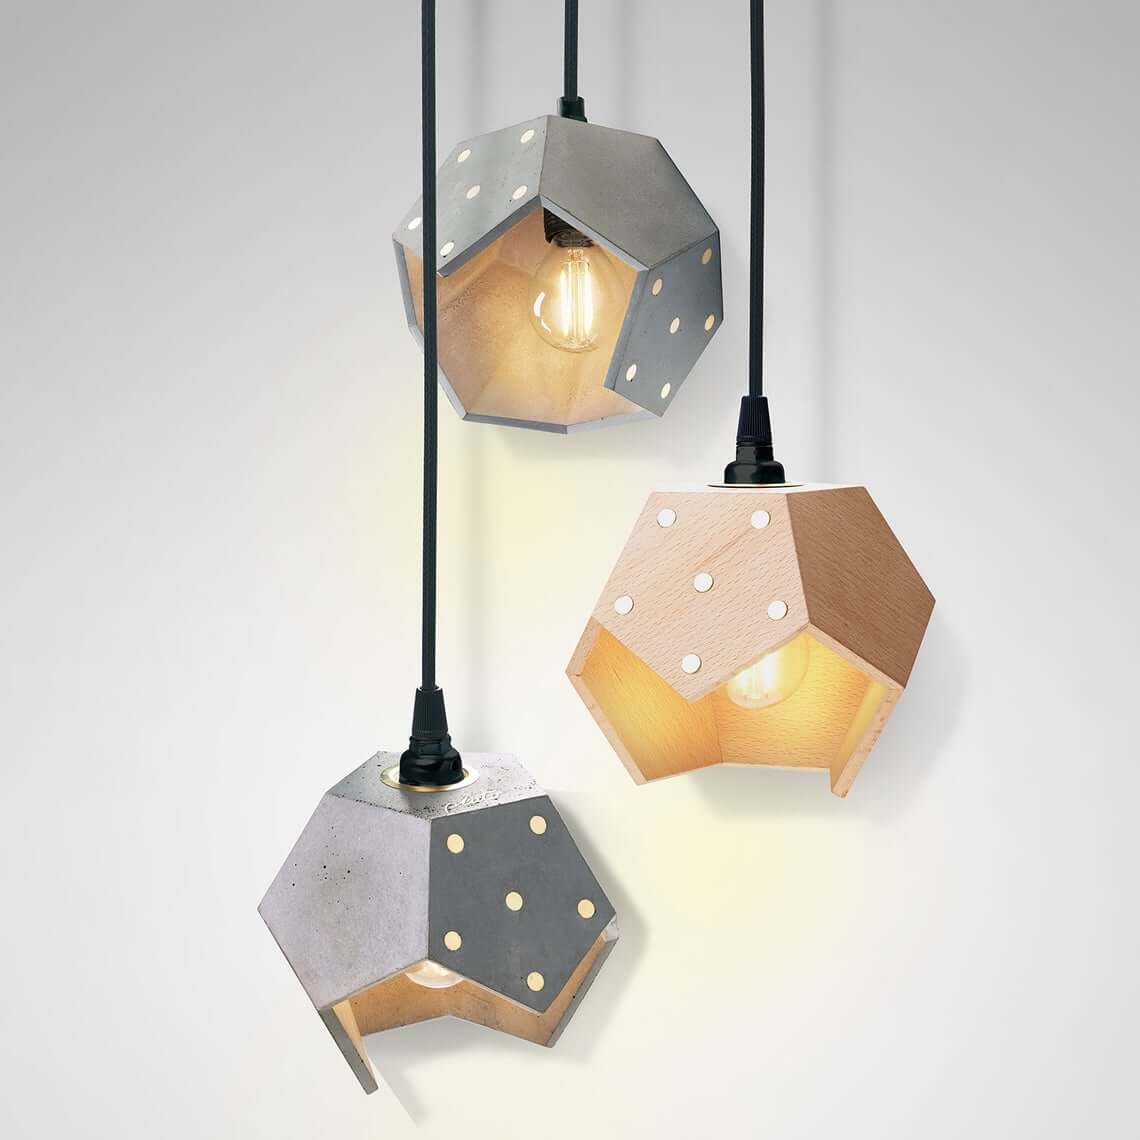 Concrete and Wood Geometric Pendant Light Trio